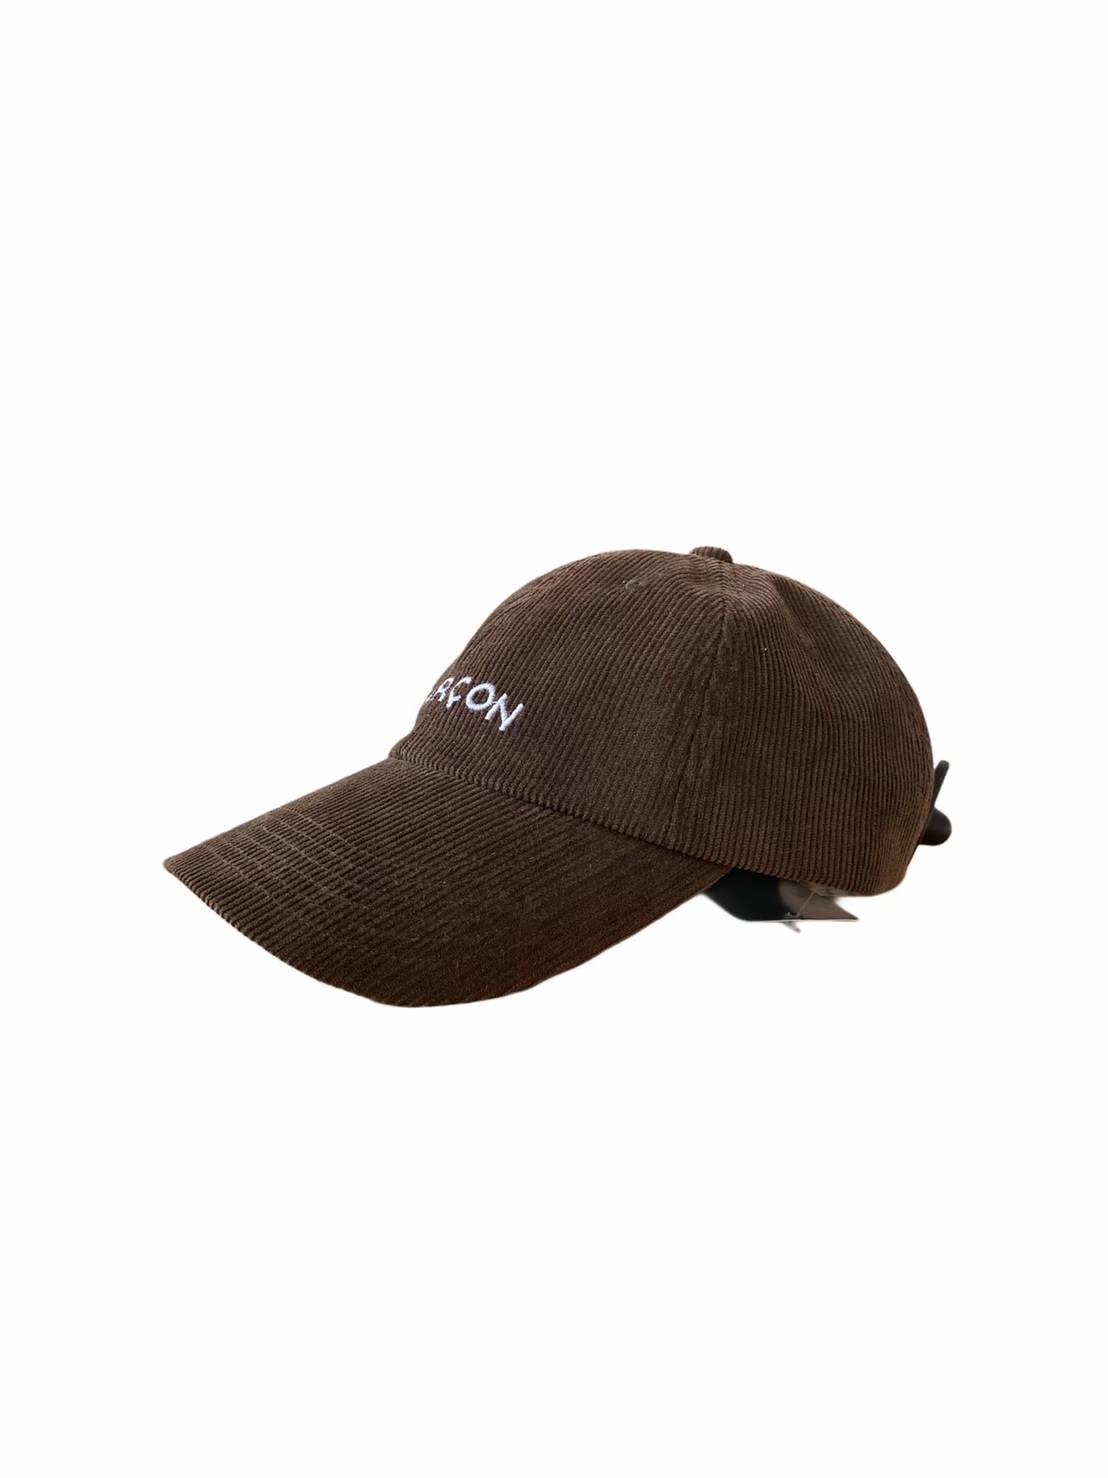 Garcon Cap (Brown)